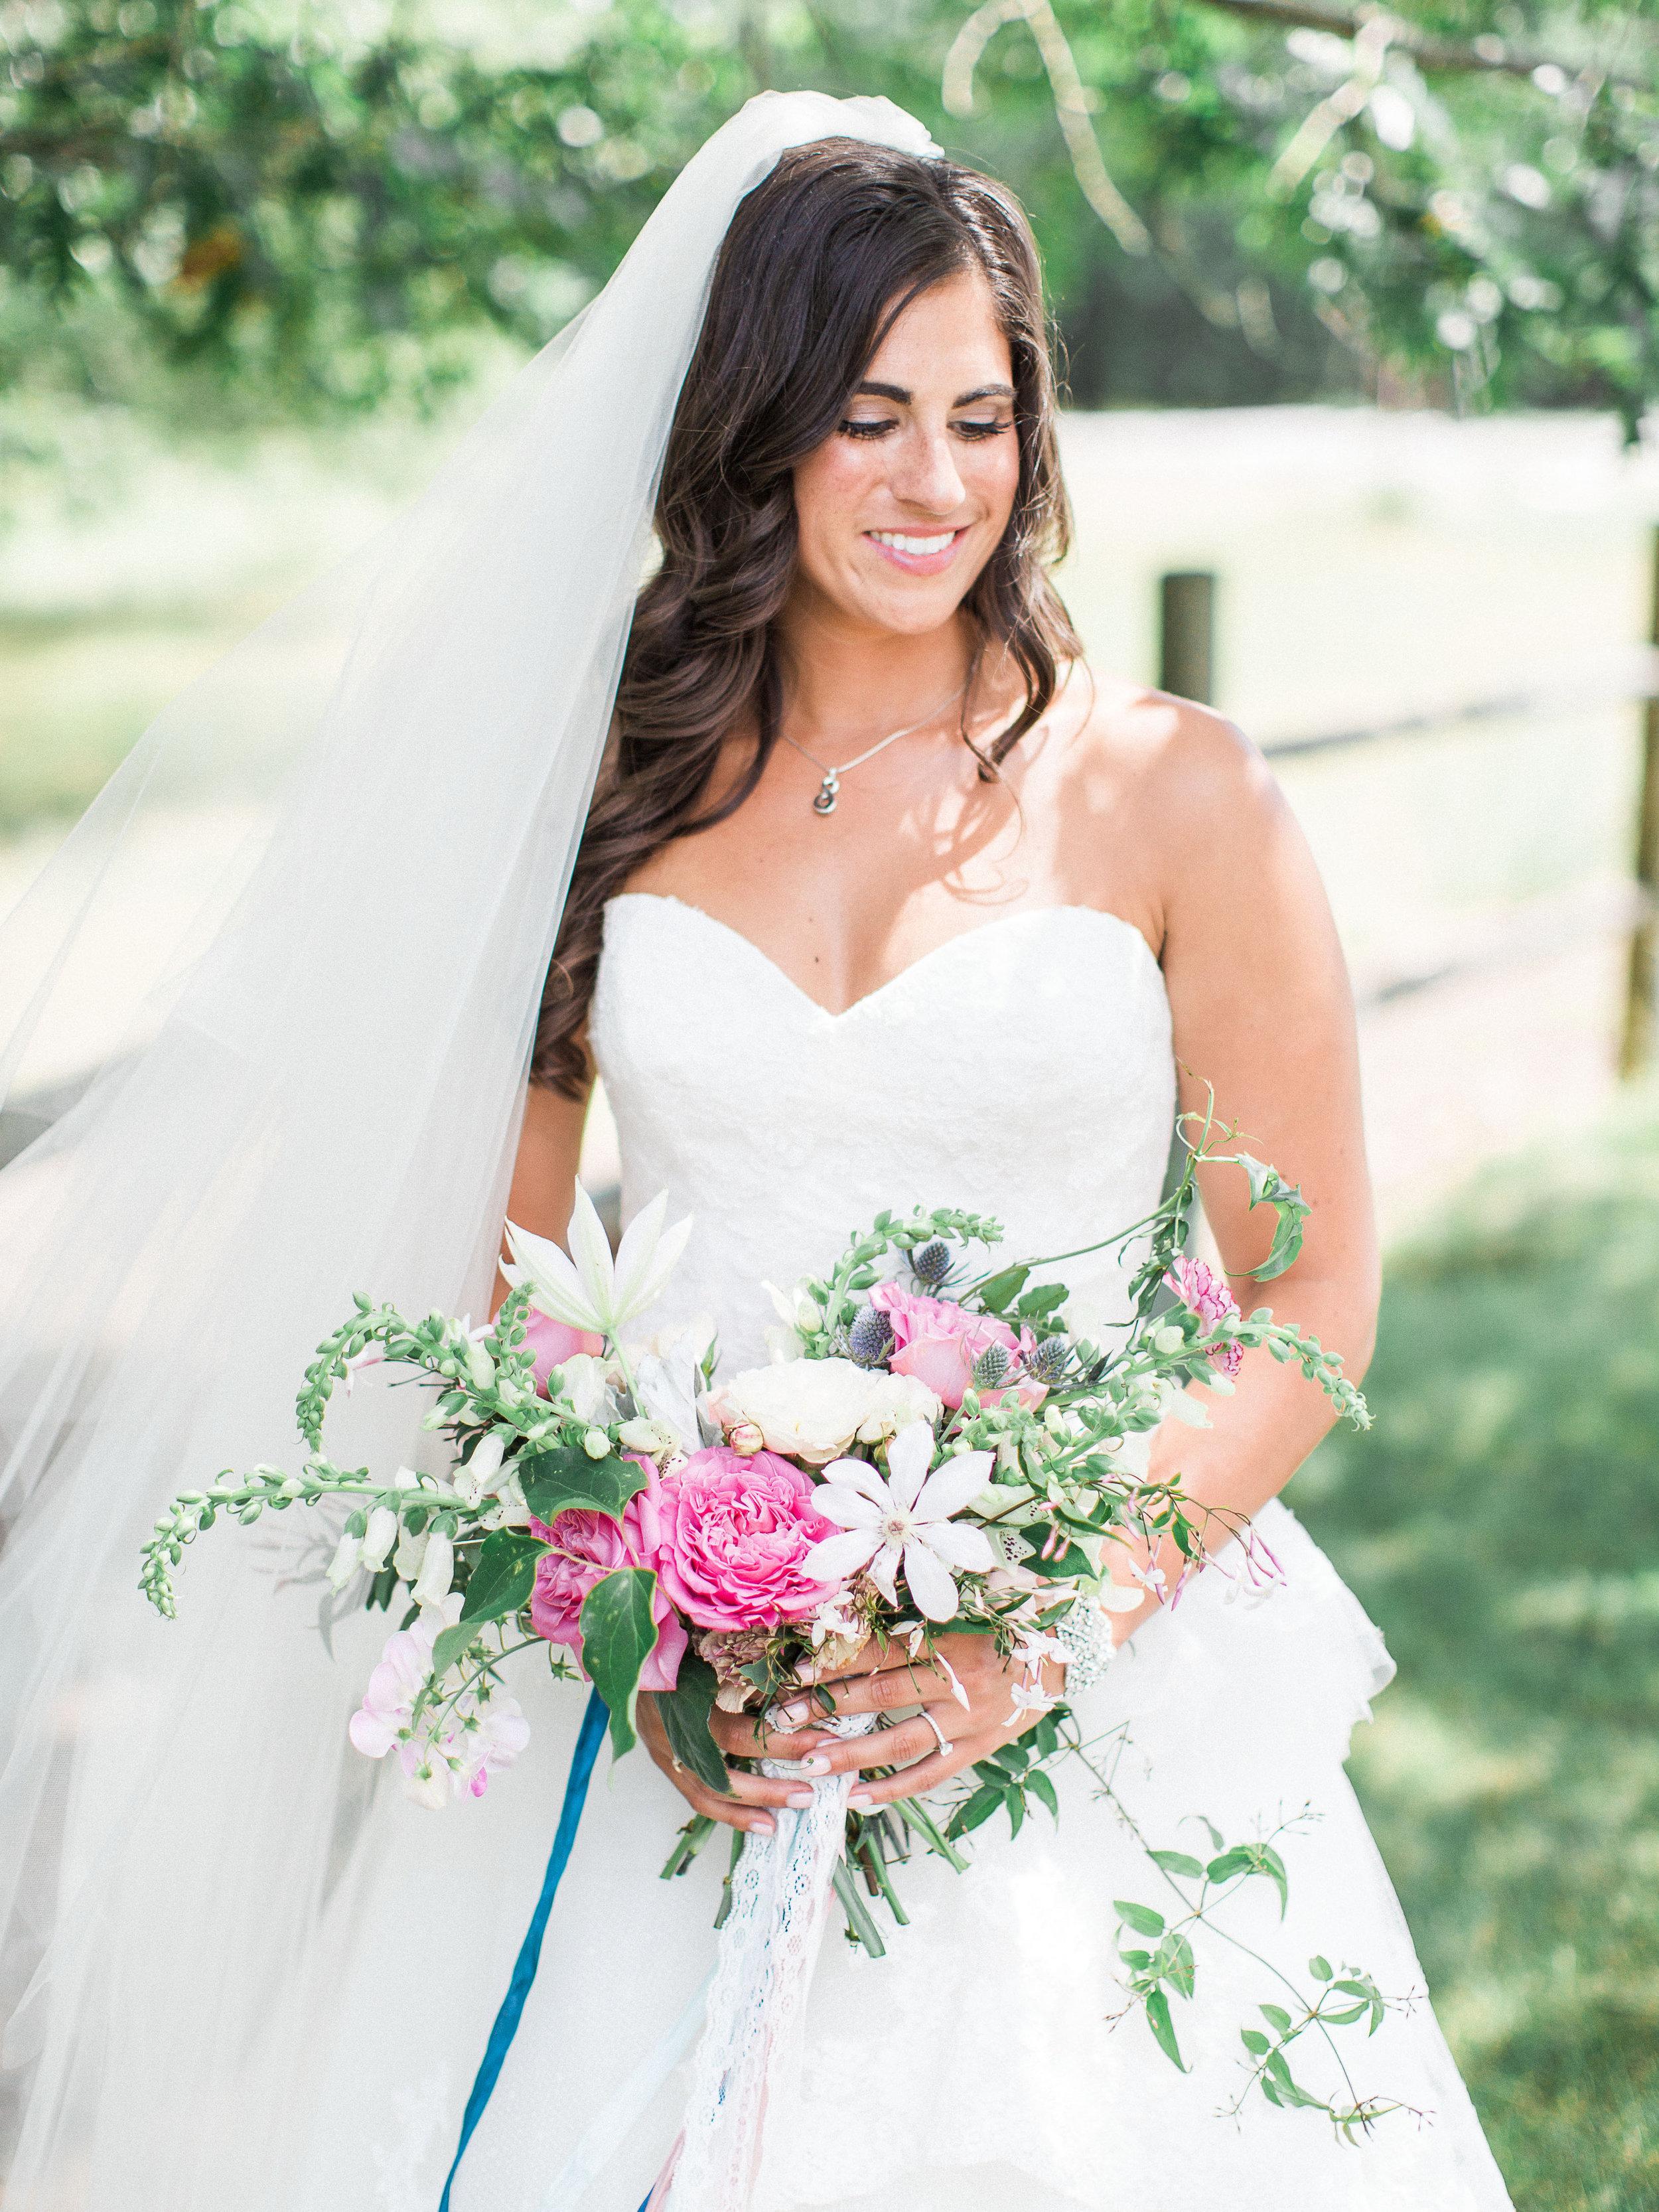 ERIC AND HALLIE WEDDING-HI RESOLUTION FOR PRINTING-0243.jpg